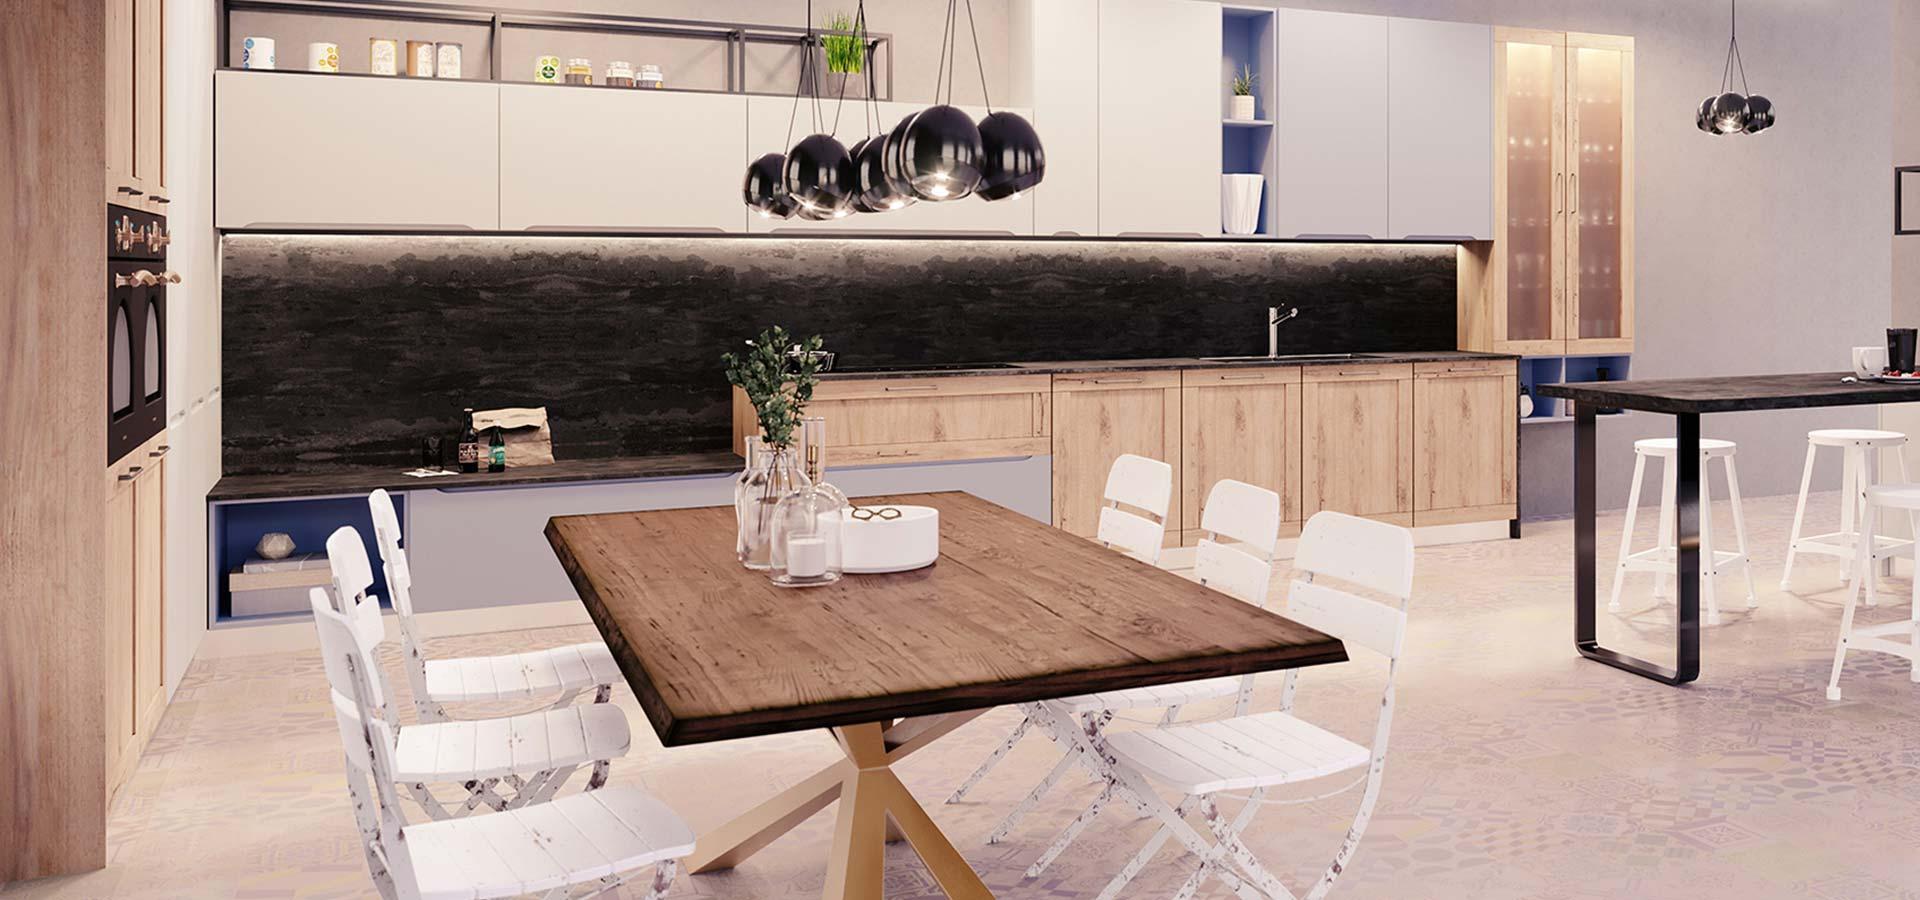 Cocinas de madera4